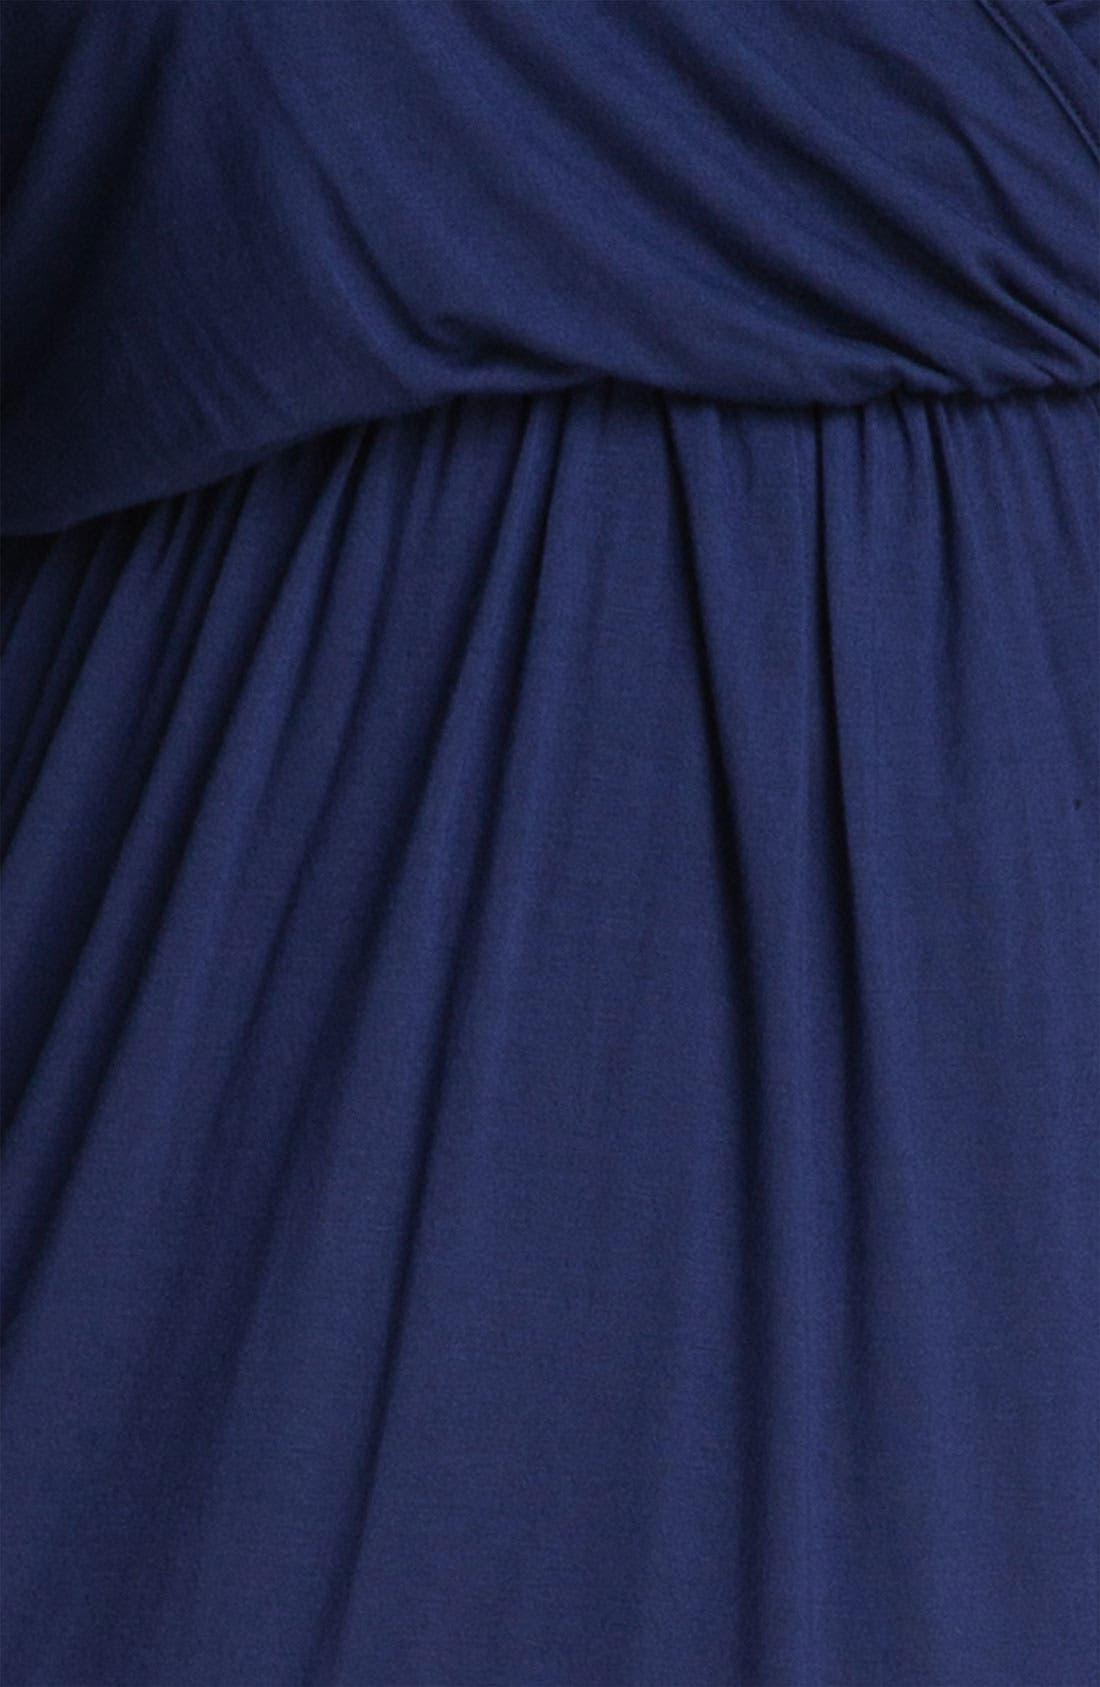 LOVEAPPELLA,                             High Low Faux Wrap Dress,                             Alternate thumbnail 2, color,                             410